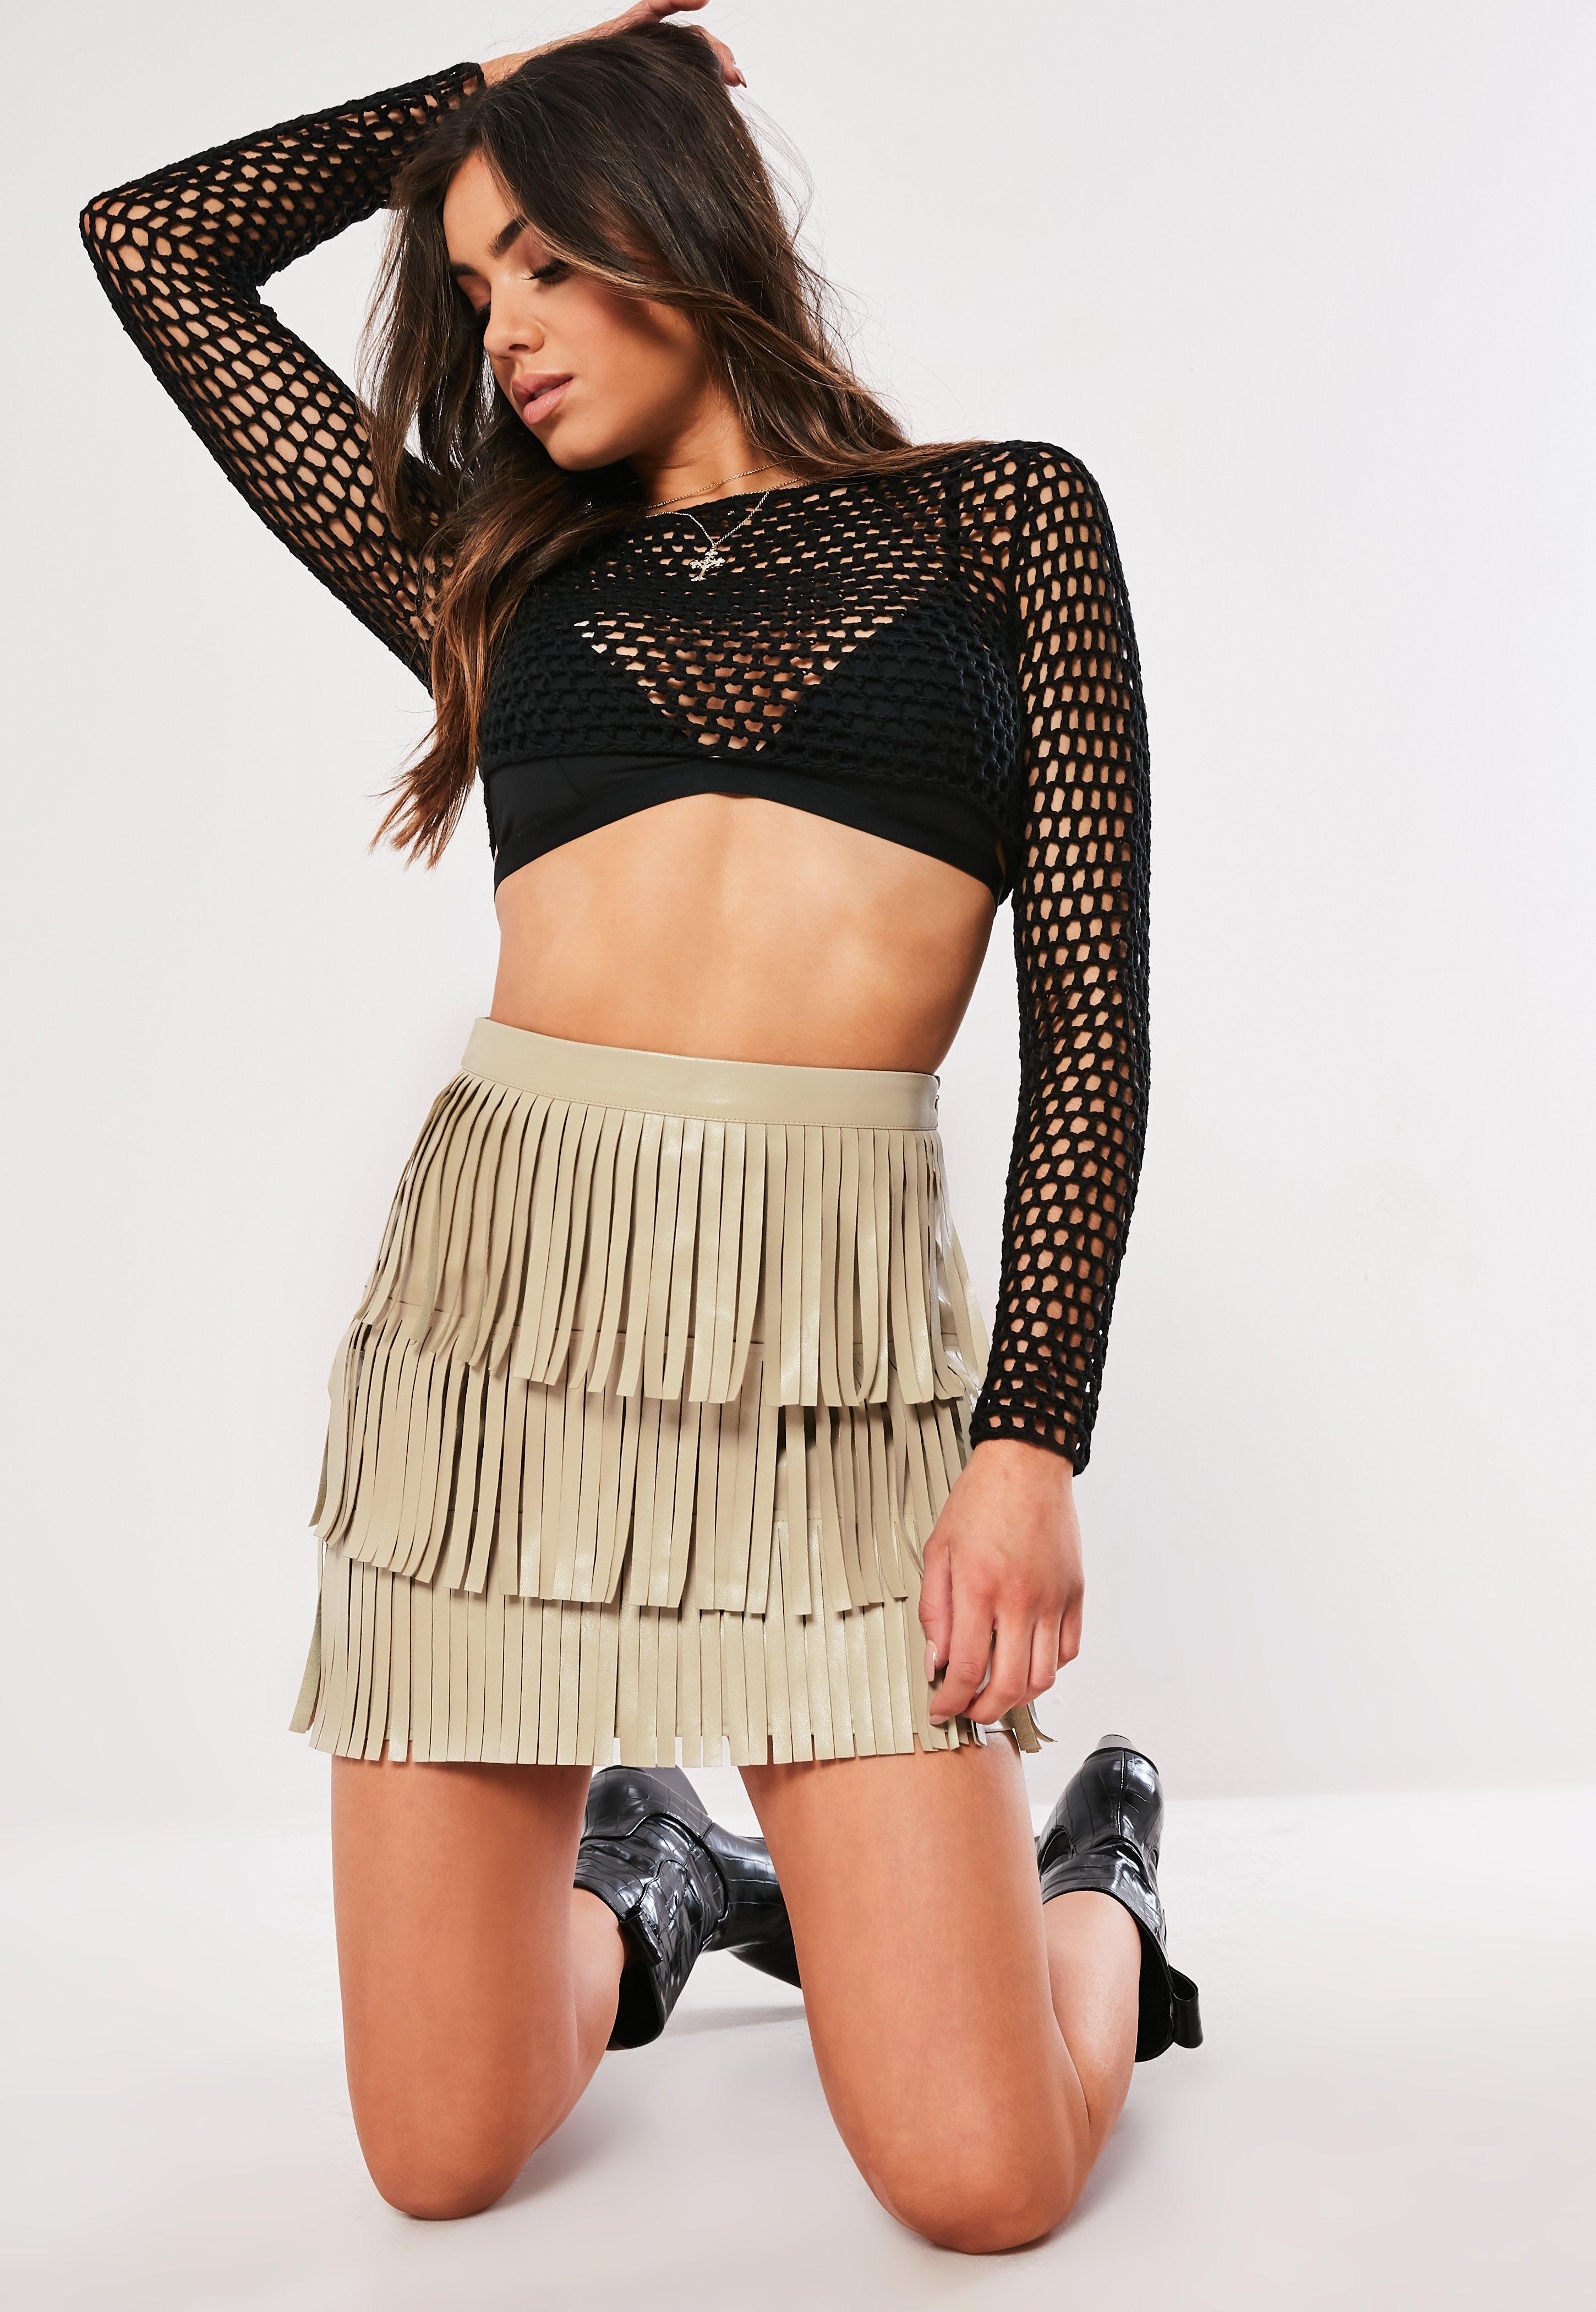 21f13d996e Fringe Clothing | Fringe Dresses, Skirts & Tops - Missguided